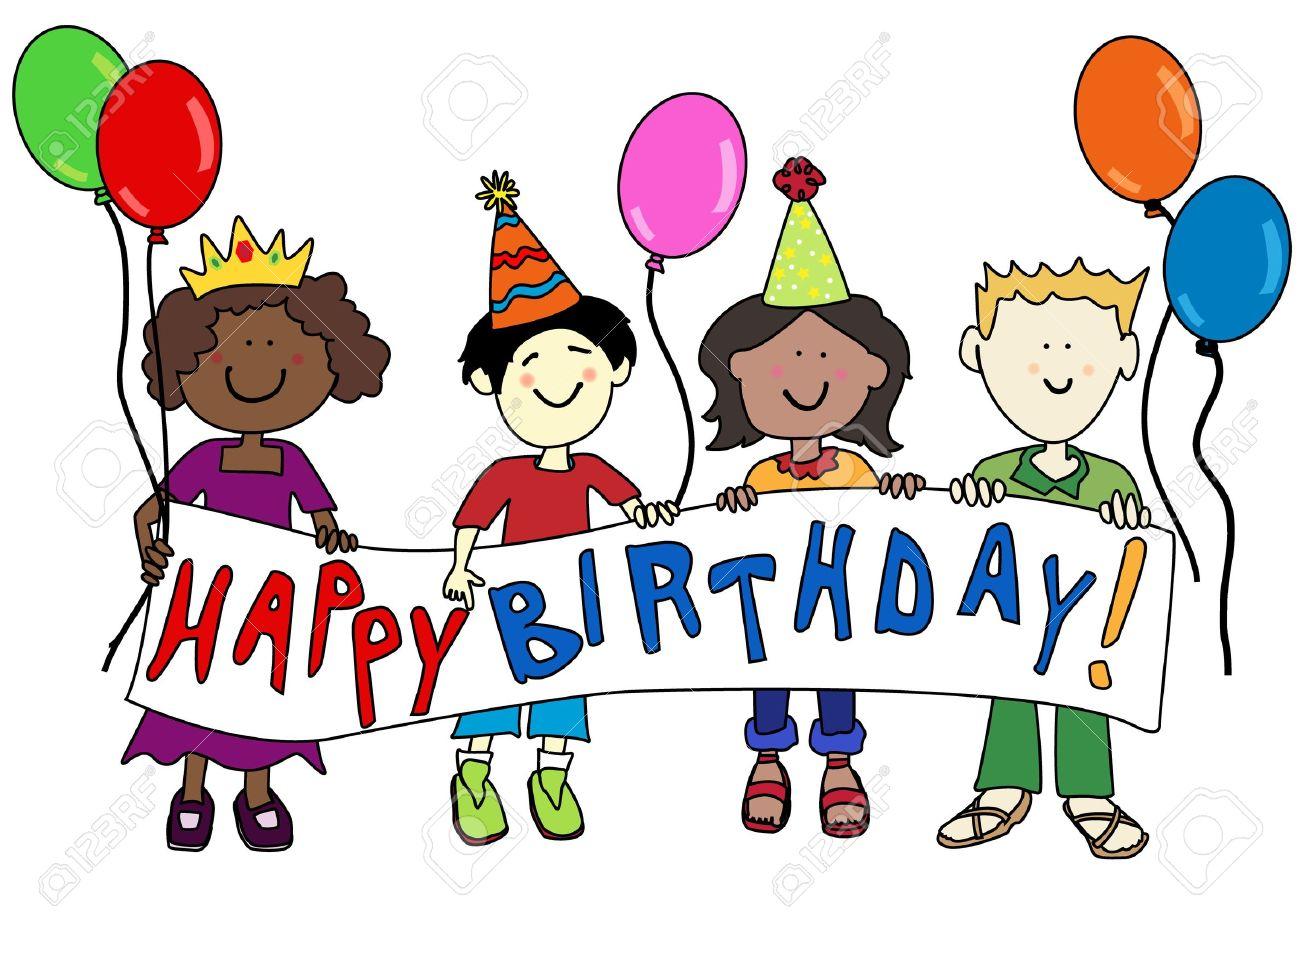 Happy Birthday Cartoon Images Free Download Best Happy